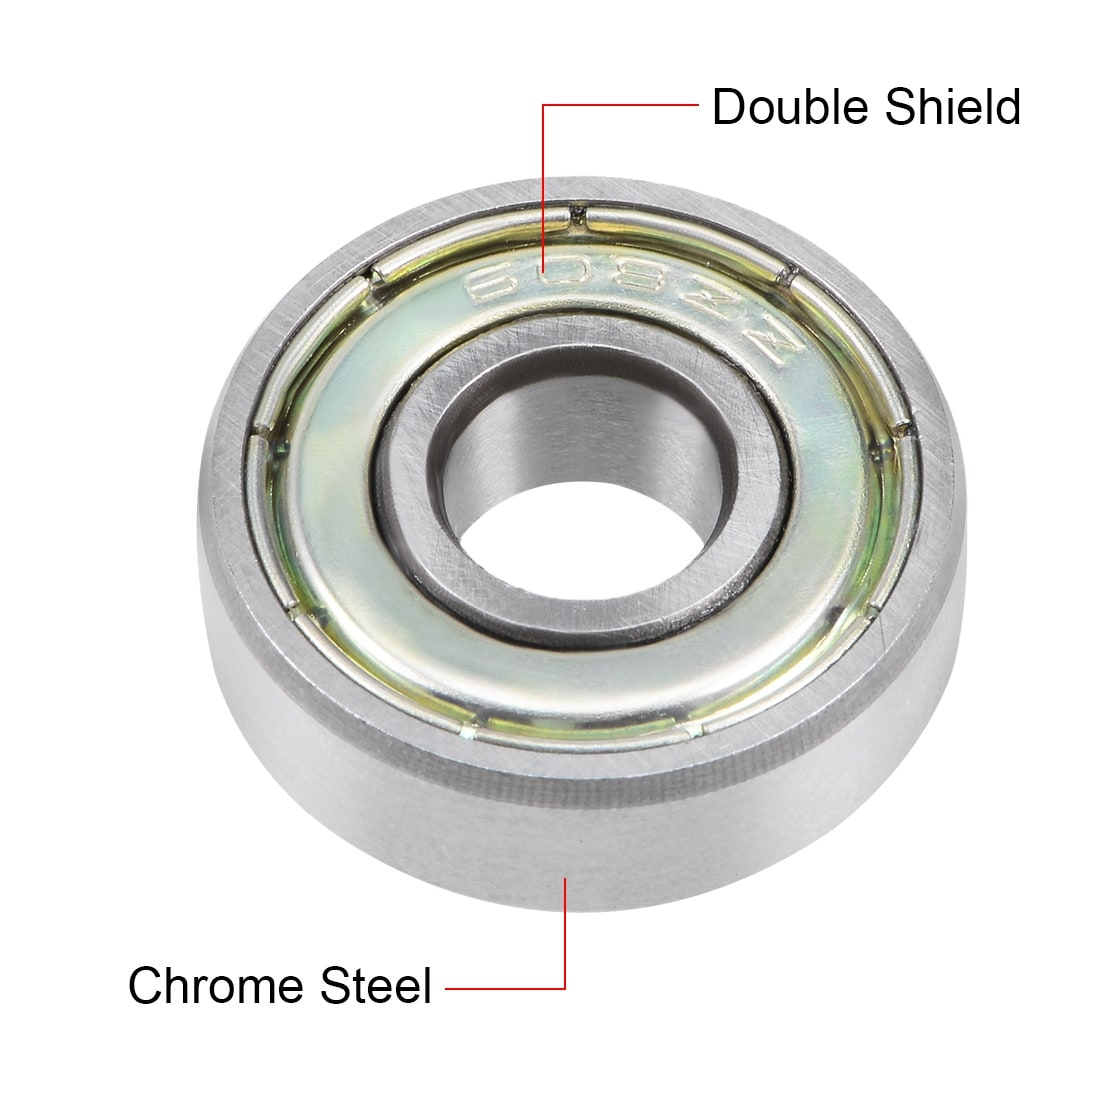 NEW 10pcs 6000ZZ Deep Groove Metal Double Shielded Ball Bearing 10mmx26mmx8mm